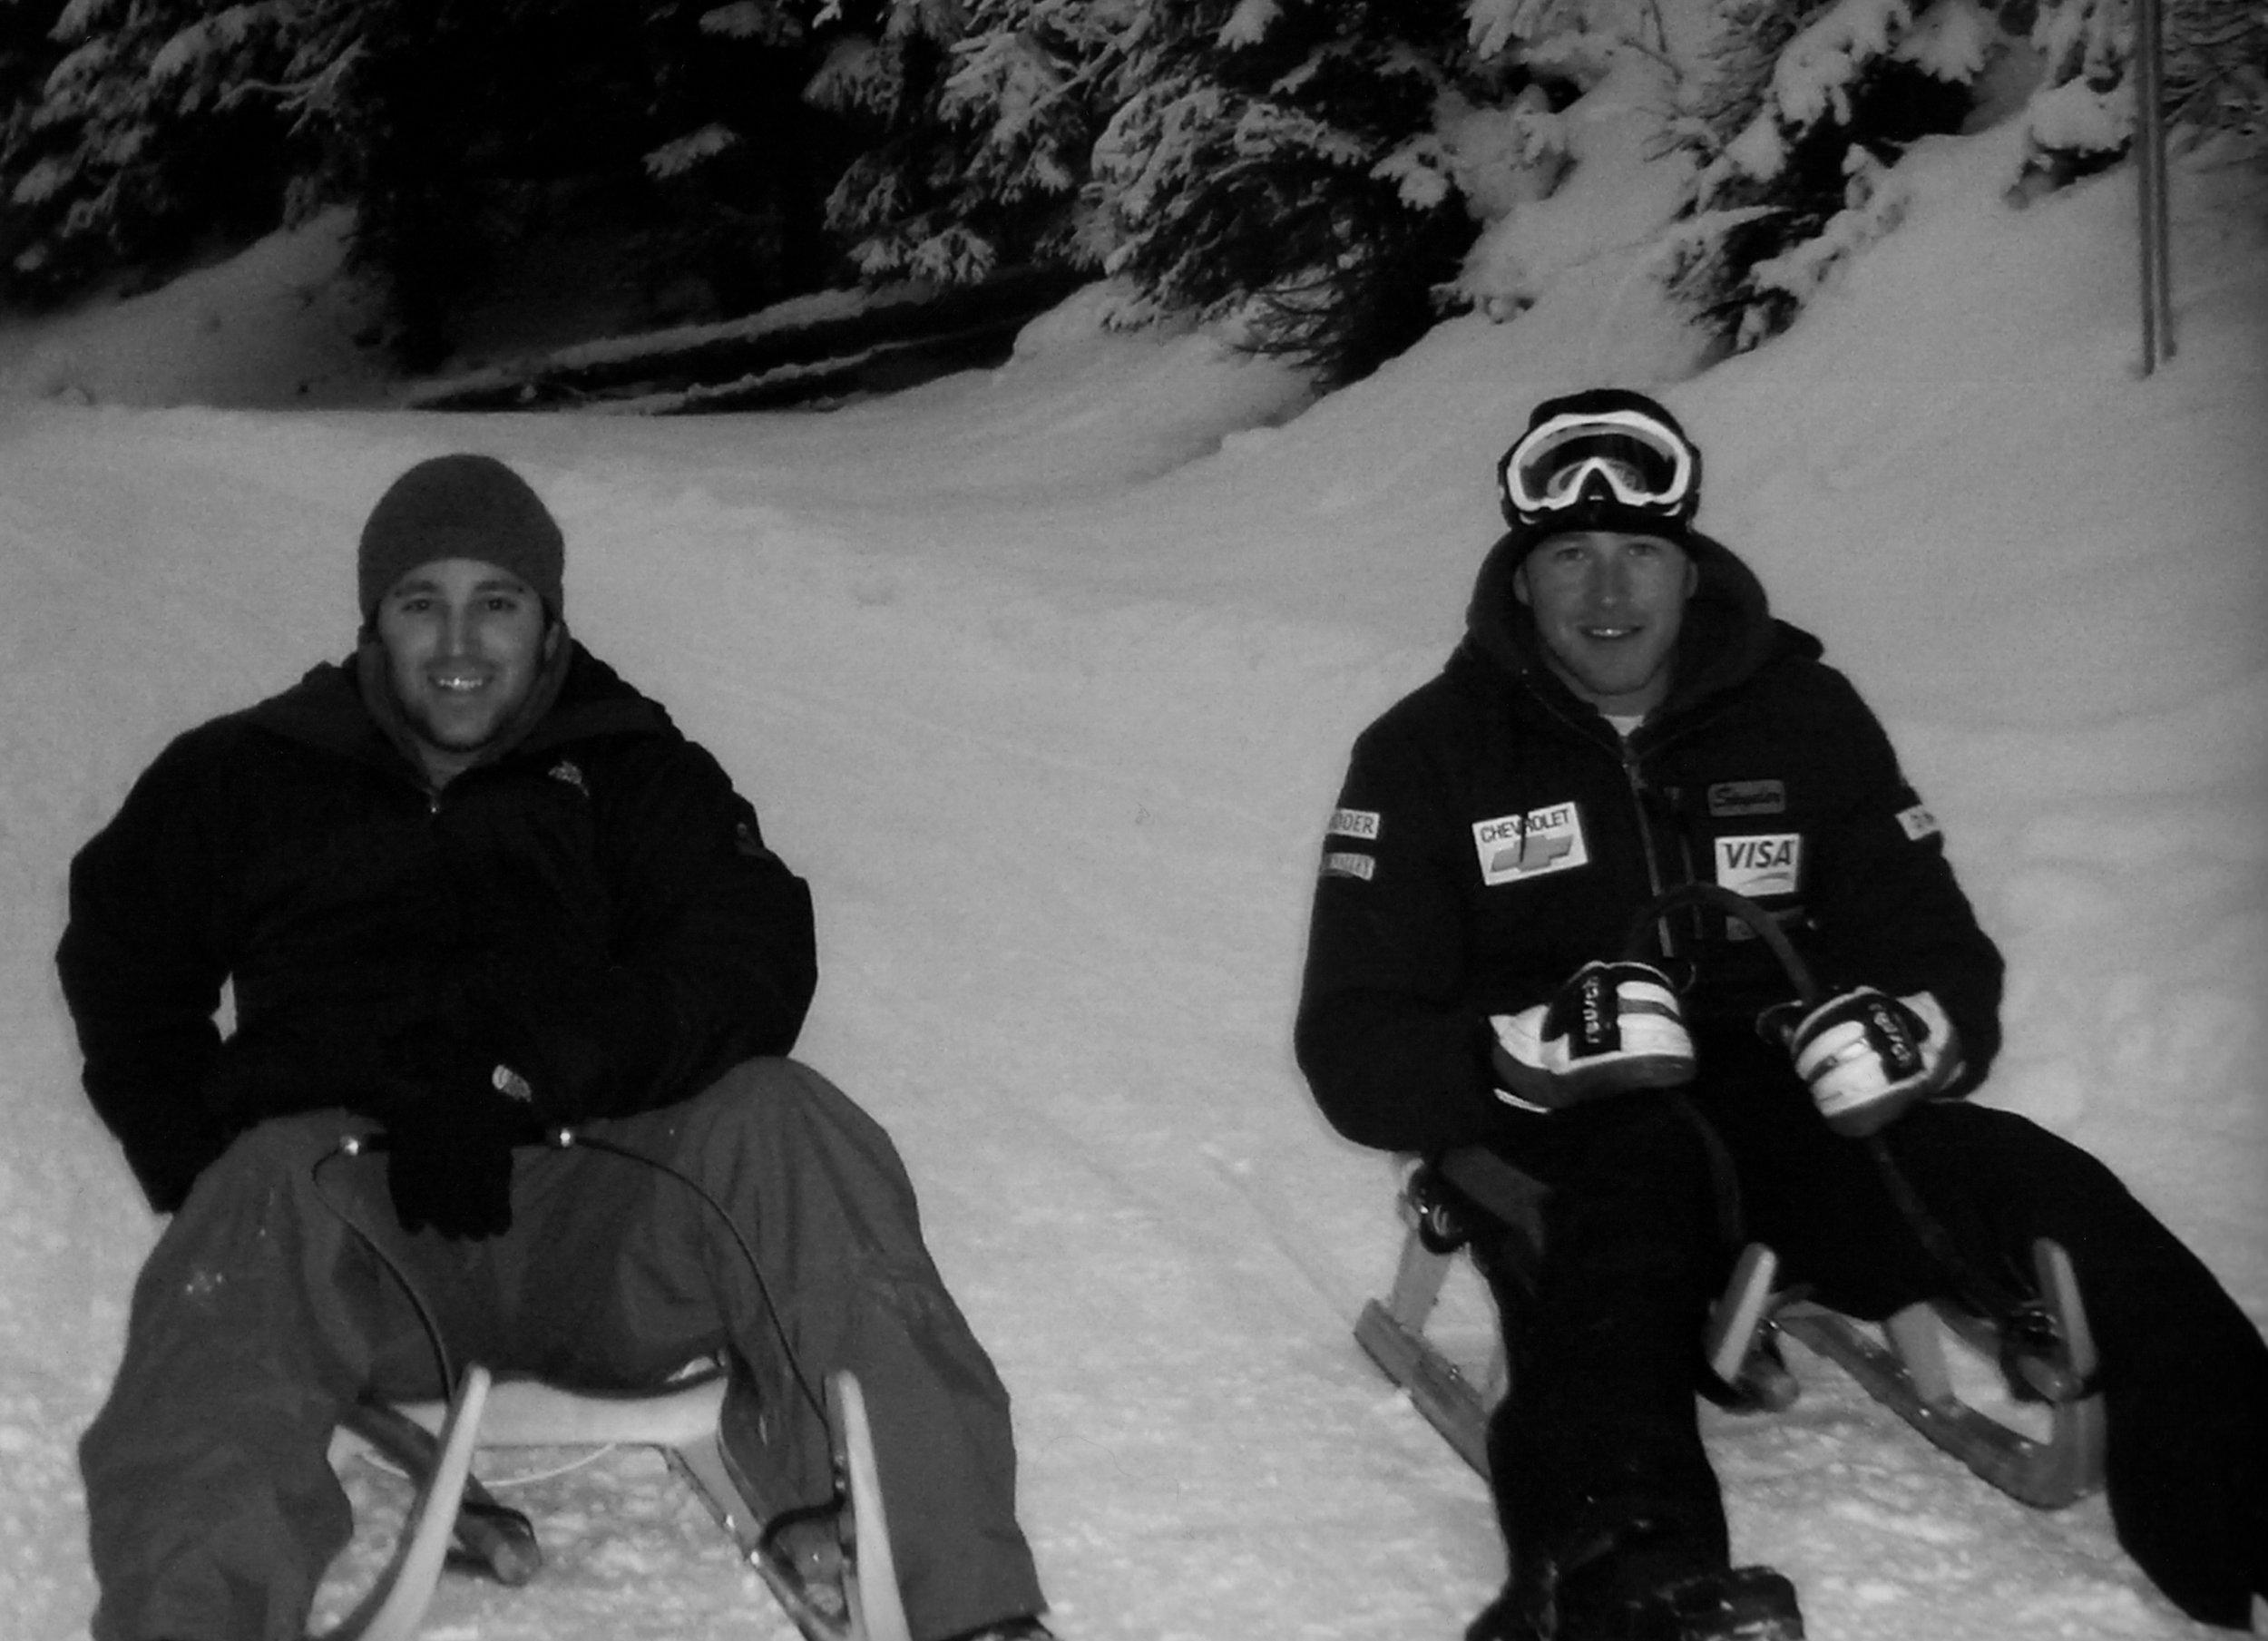 Founder/CEO Brett Rapkin and US Ski Racing Legend Bode Miller  Austrian Alps, 2004